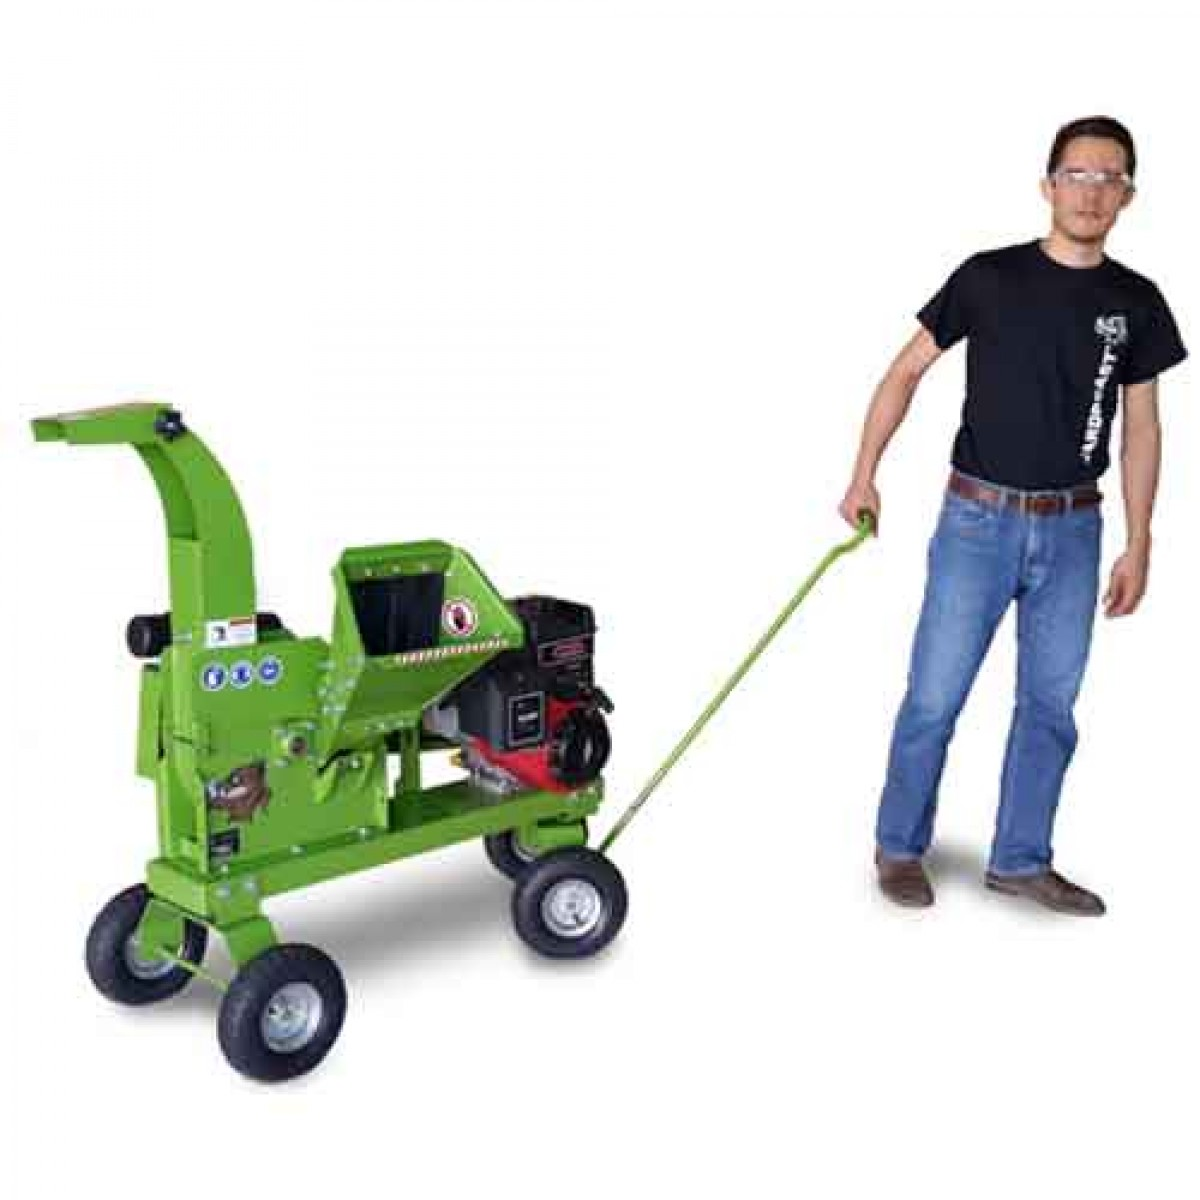 Yardbeast 2510 | Professional Wood Chipper | ConstructionComplete